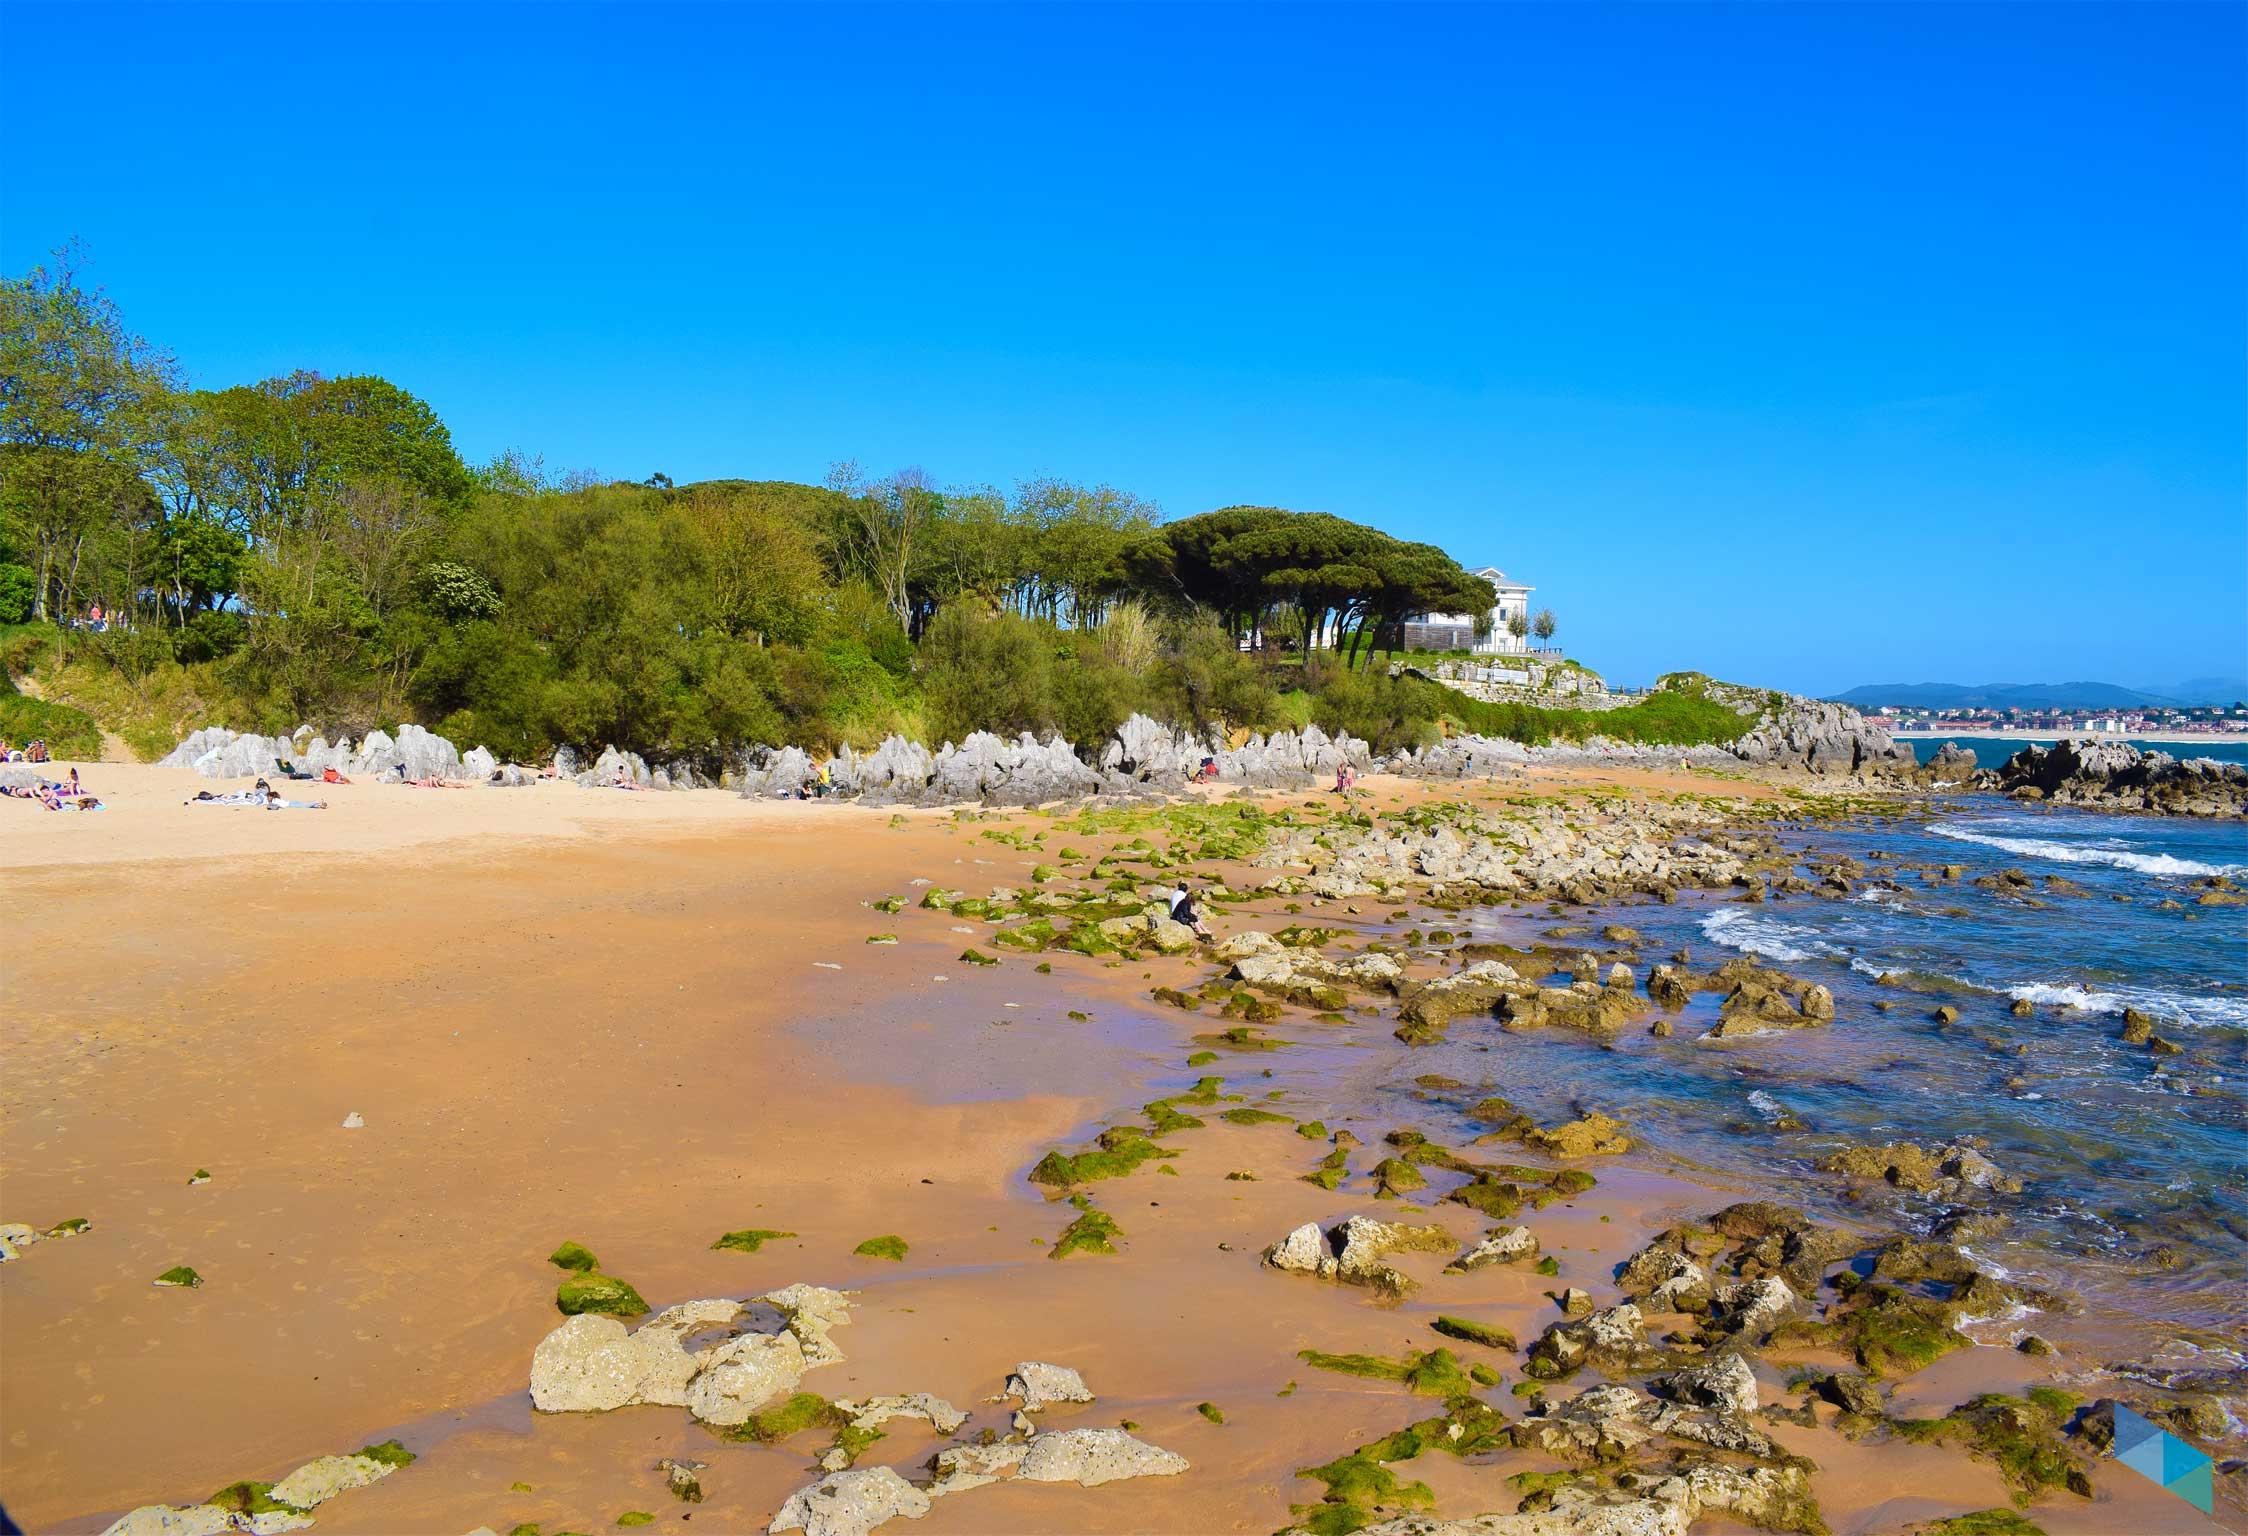 Playa de bikini Marea muy baja